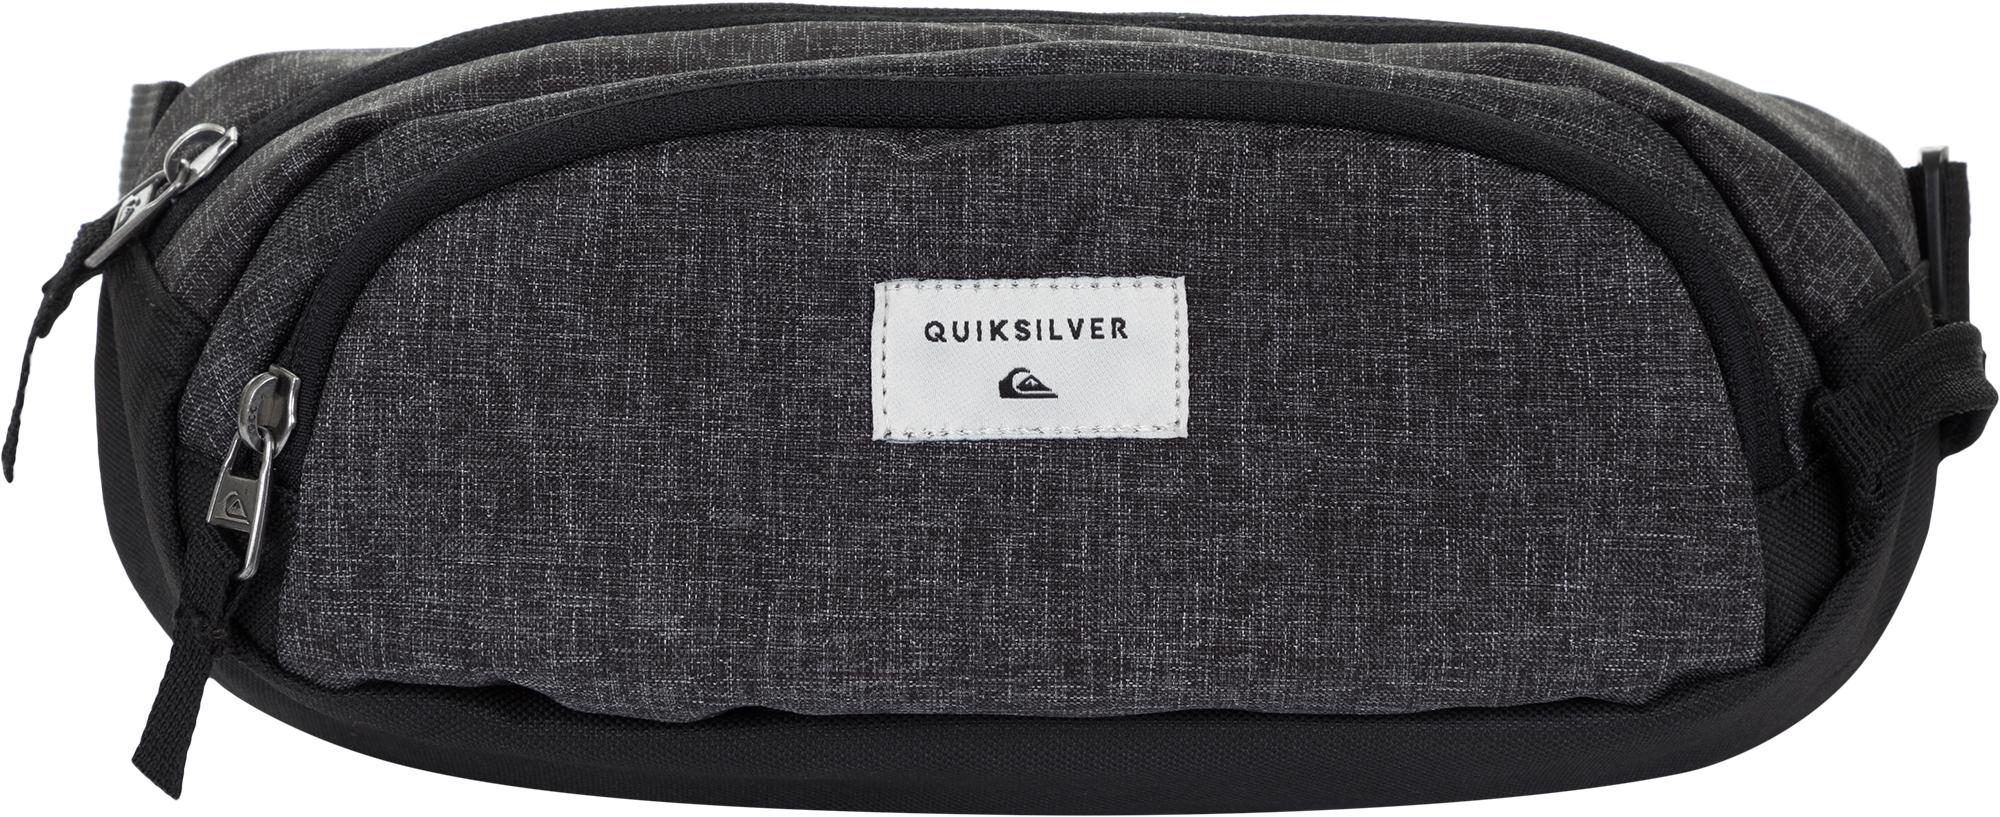 Quiksilver Сумка на пояс Quiksilver Smugglet, размер Без размера